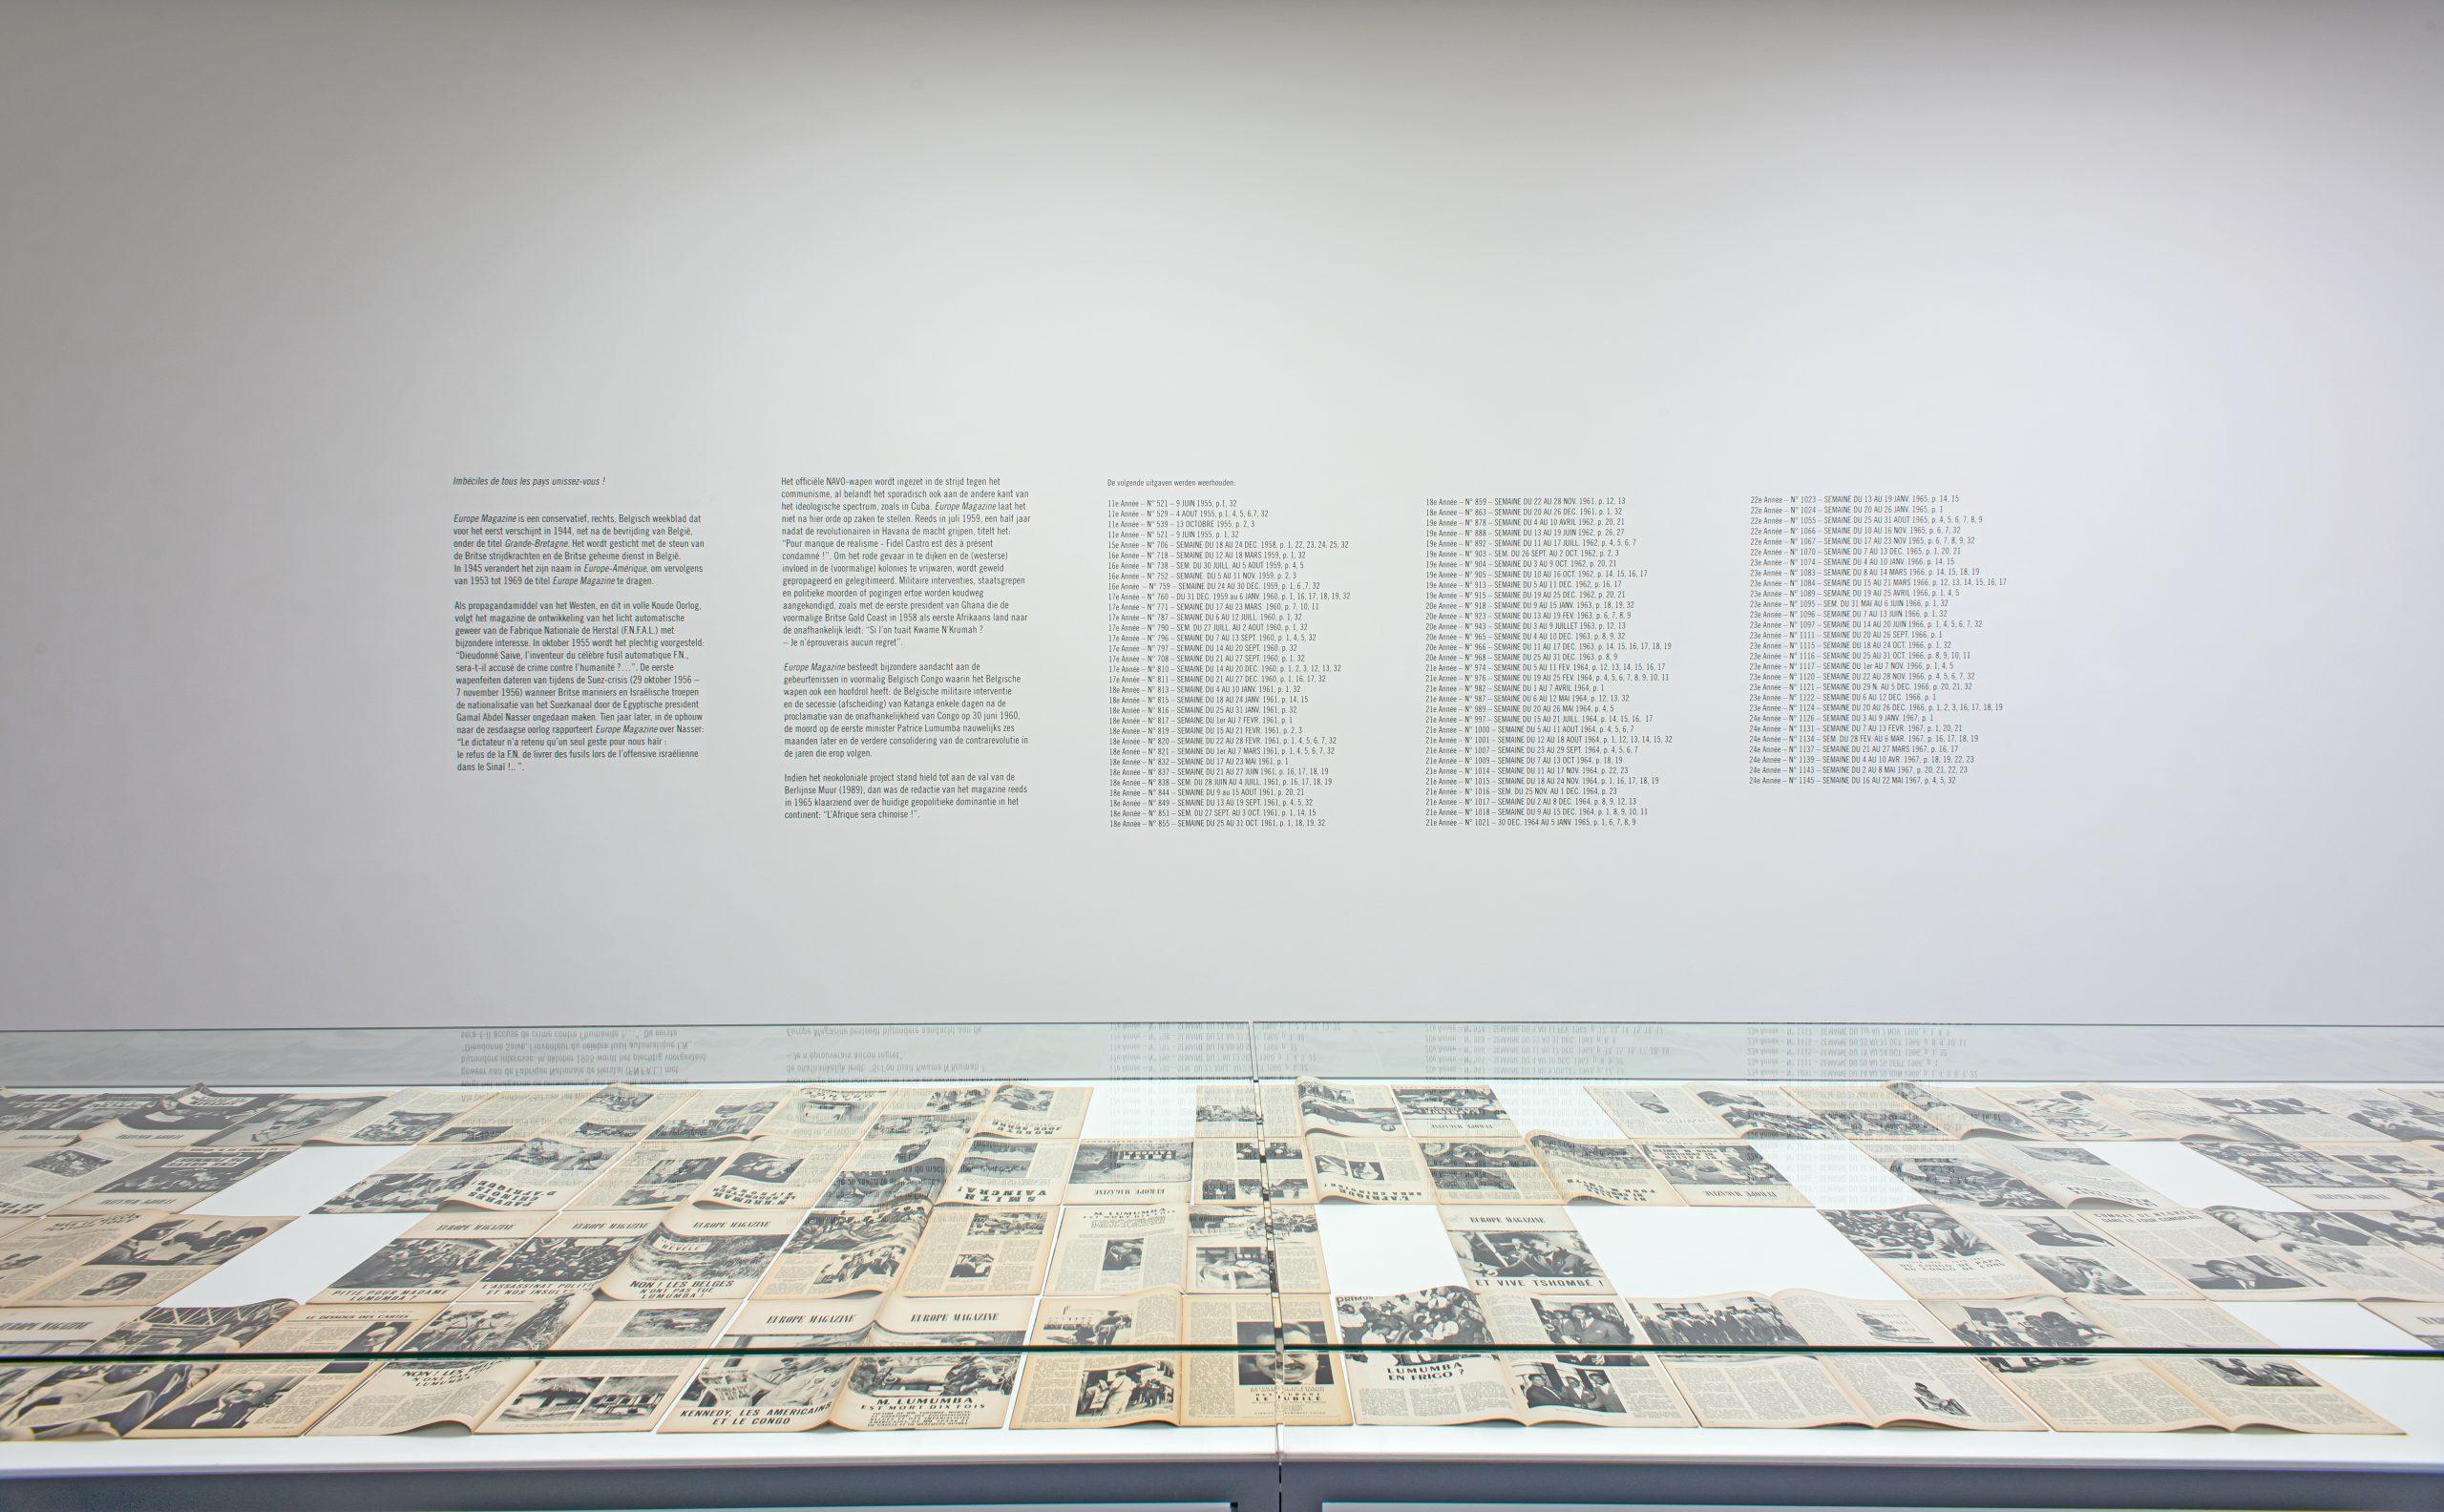 Sven Augustijnen, installation view at MHKA, 2020